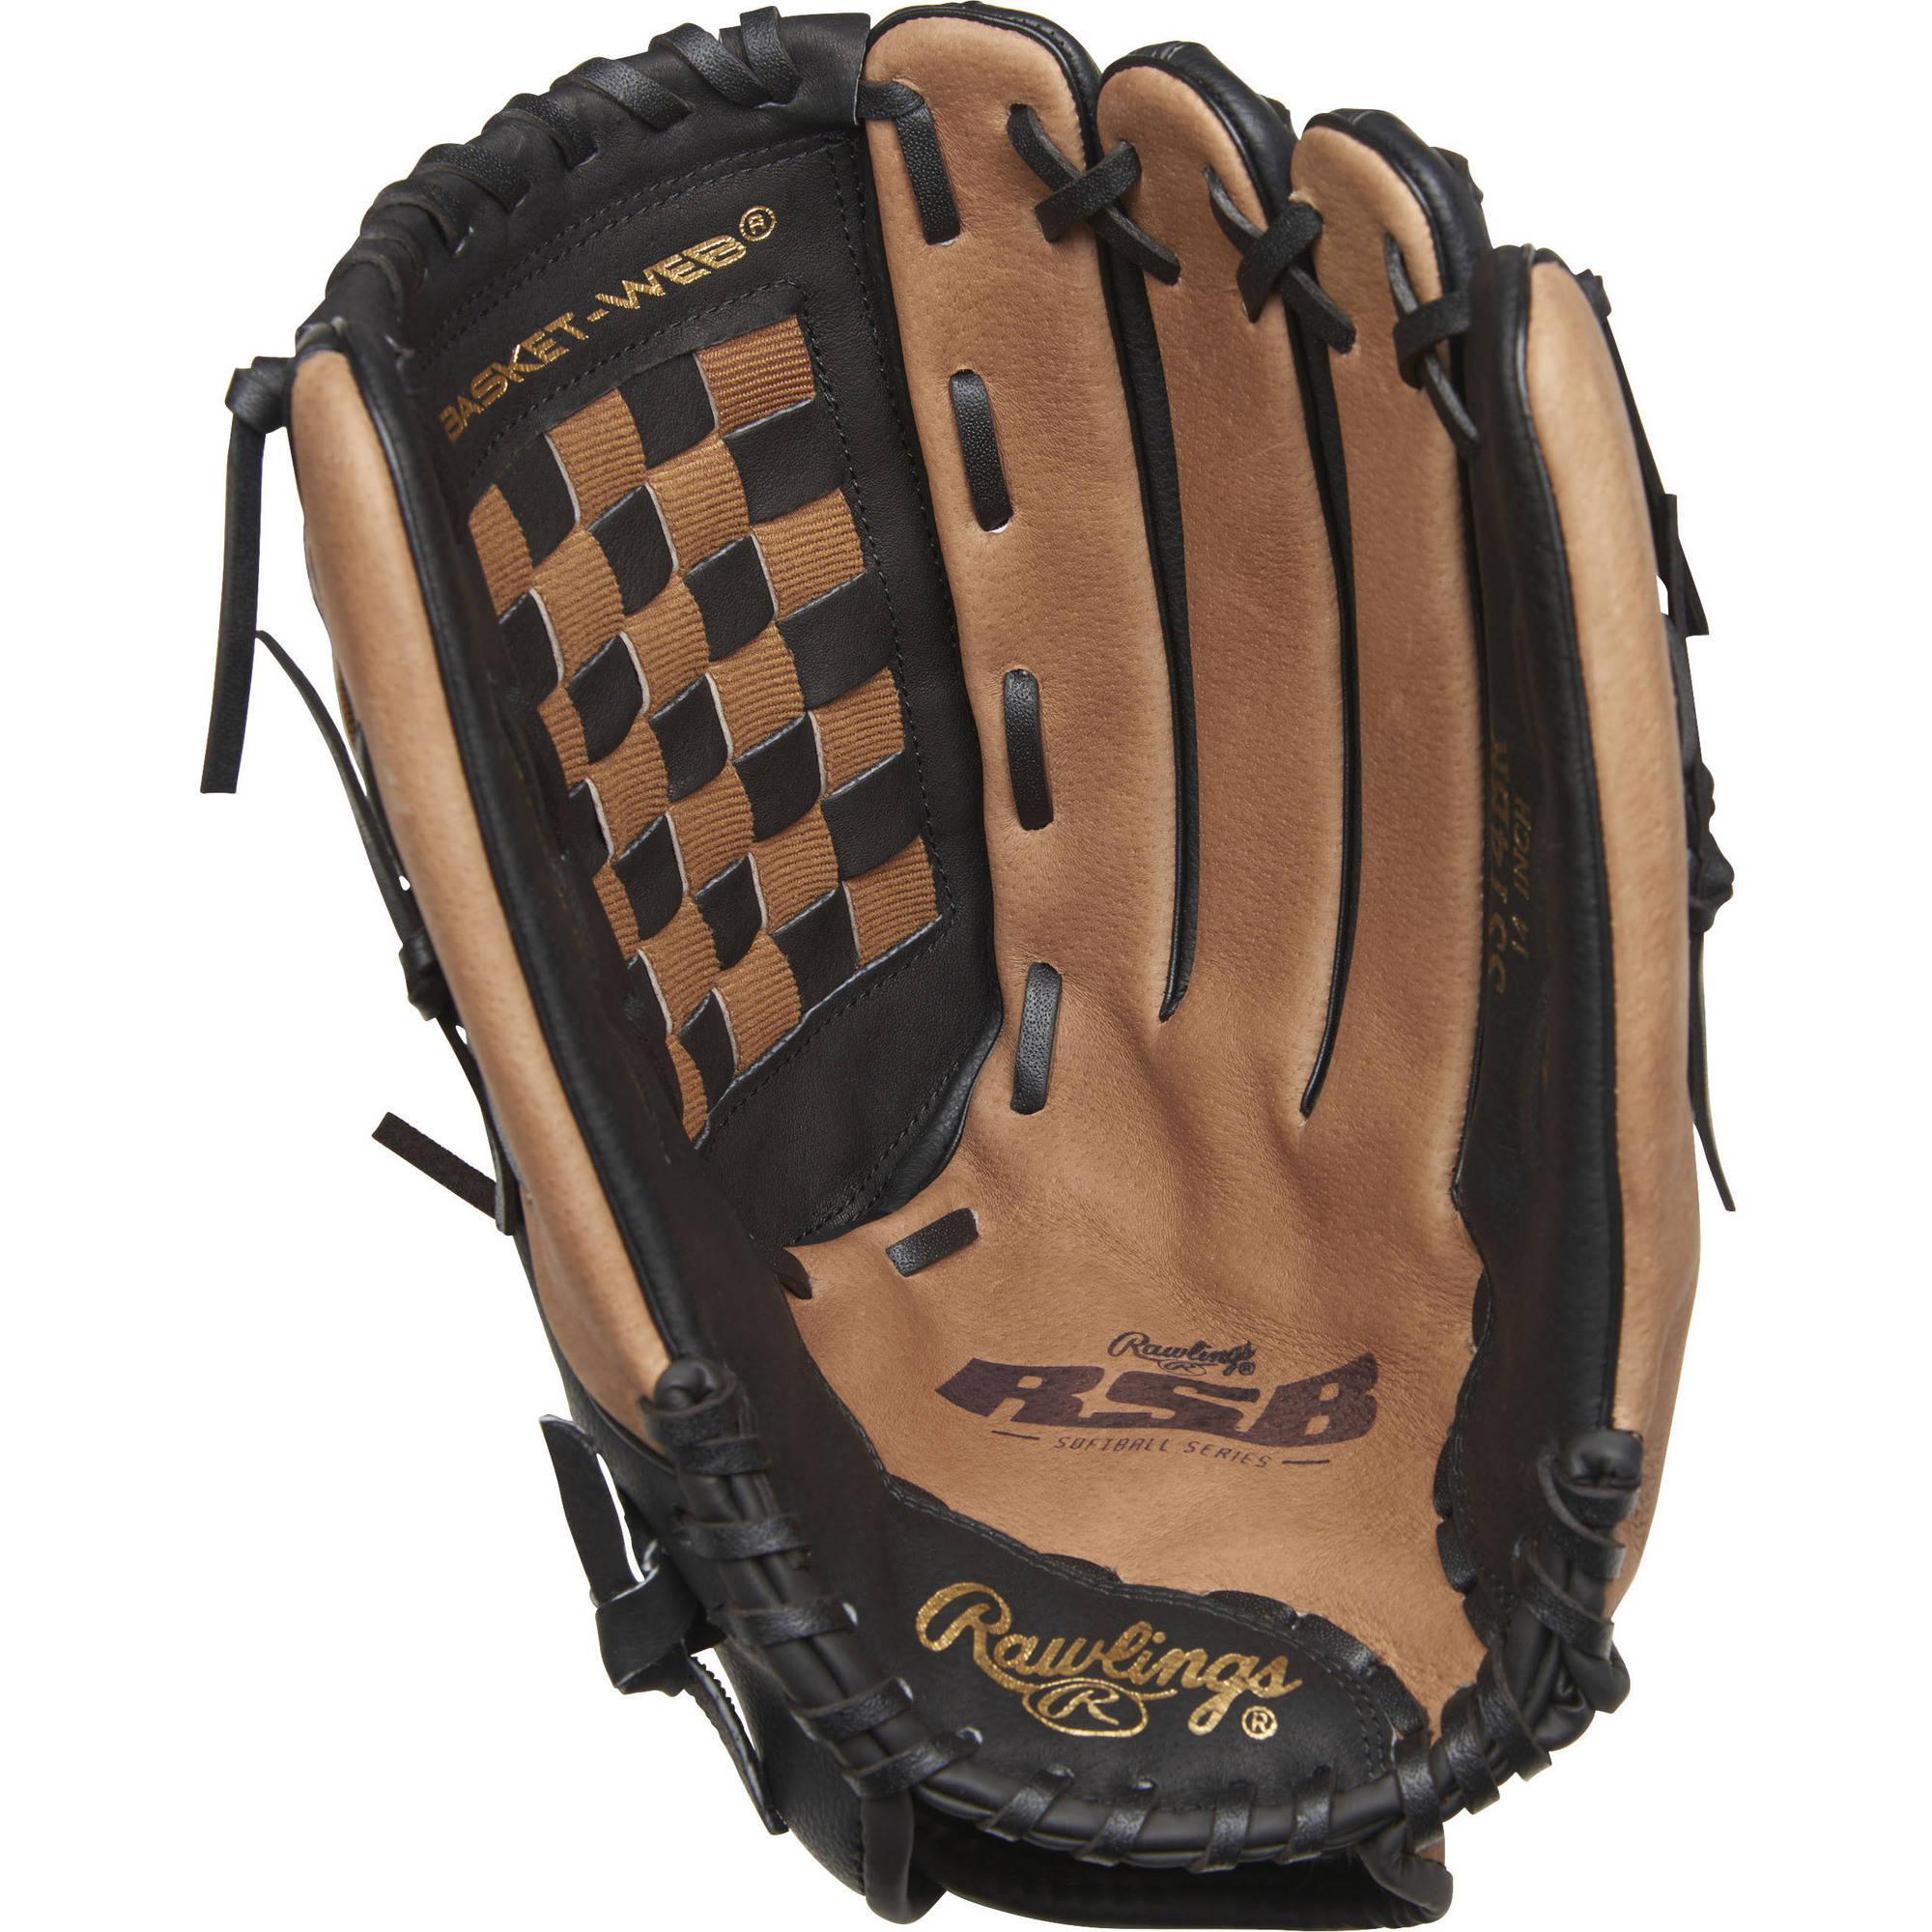 "Rawlings 14"" Slowpitch Softball Fielder's Glove by Rawlings Sporting Goods"